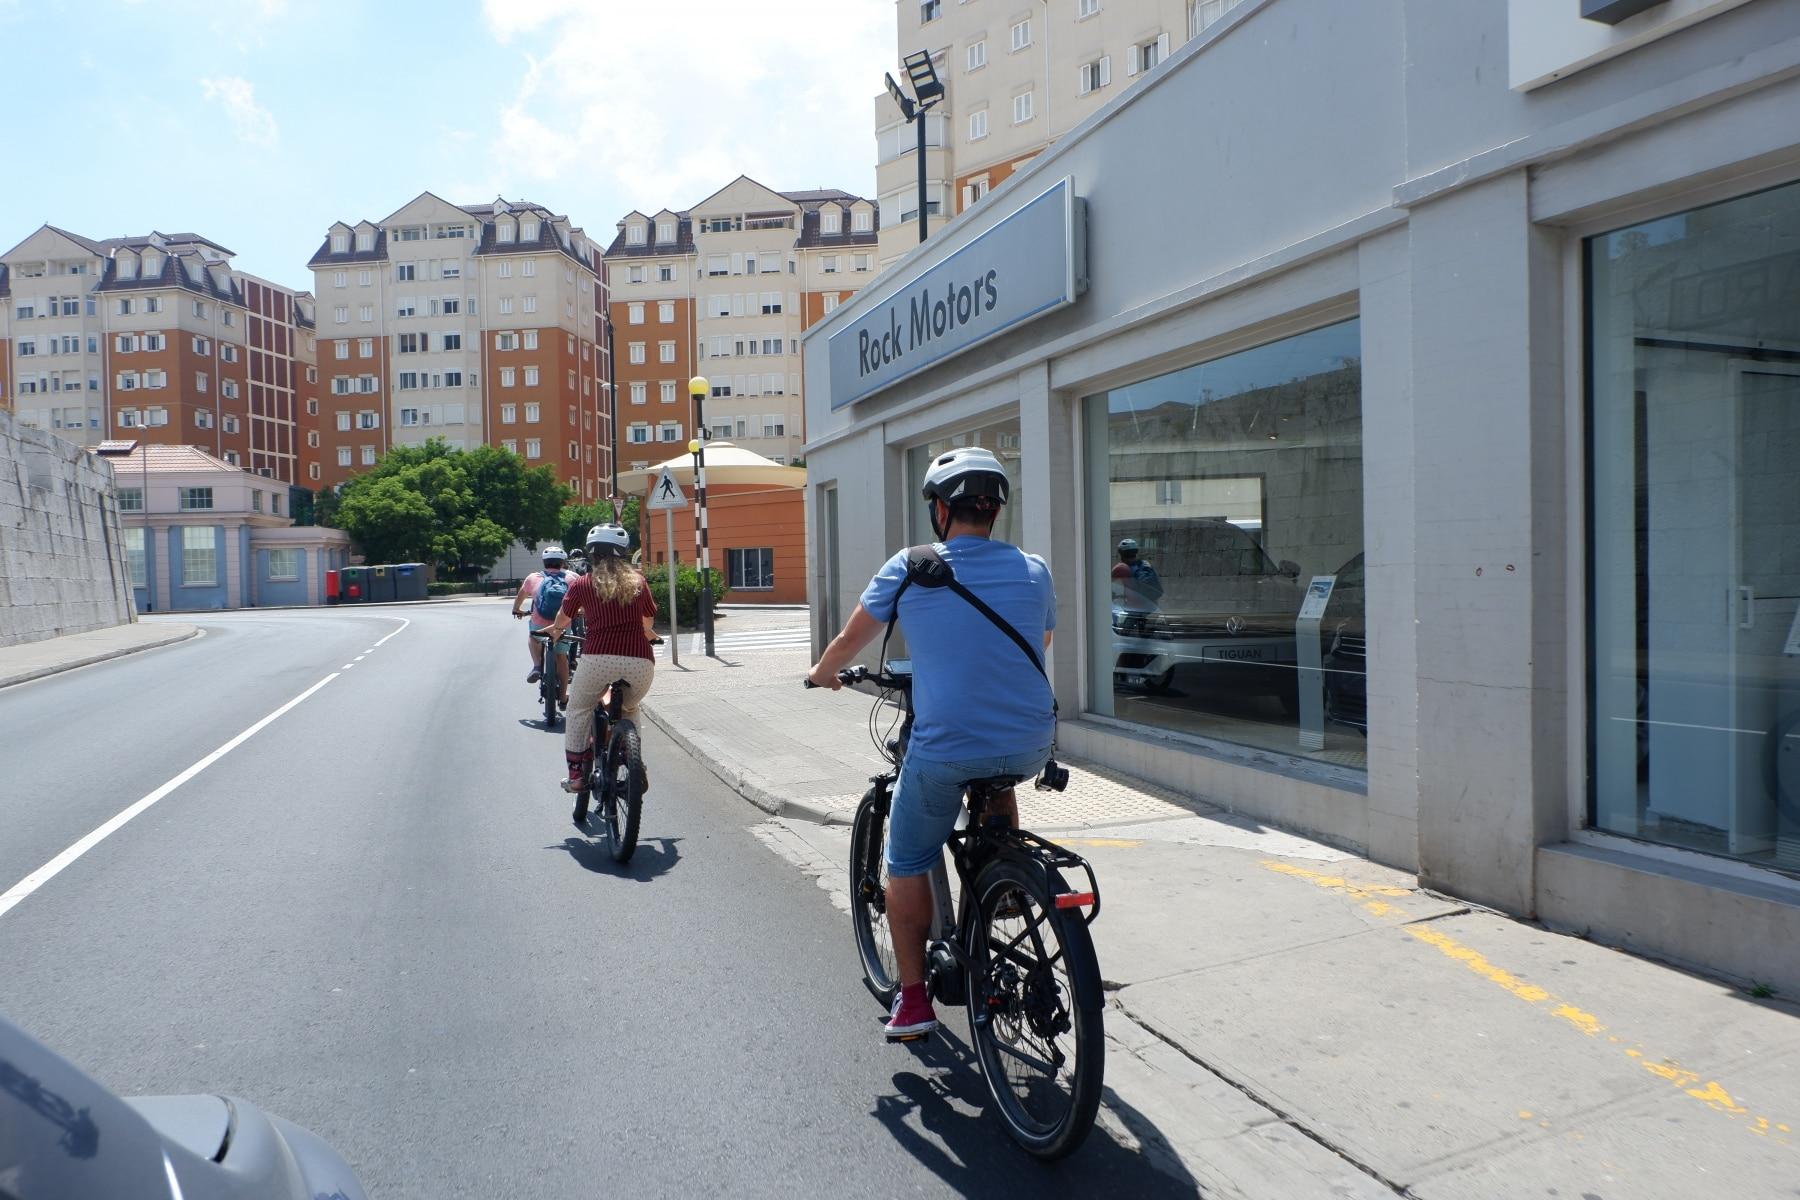 23-jun-2019-blogueros-espaoles-de-viajes-visitan-el-pen_48131067056_o